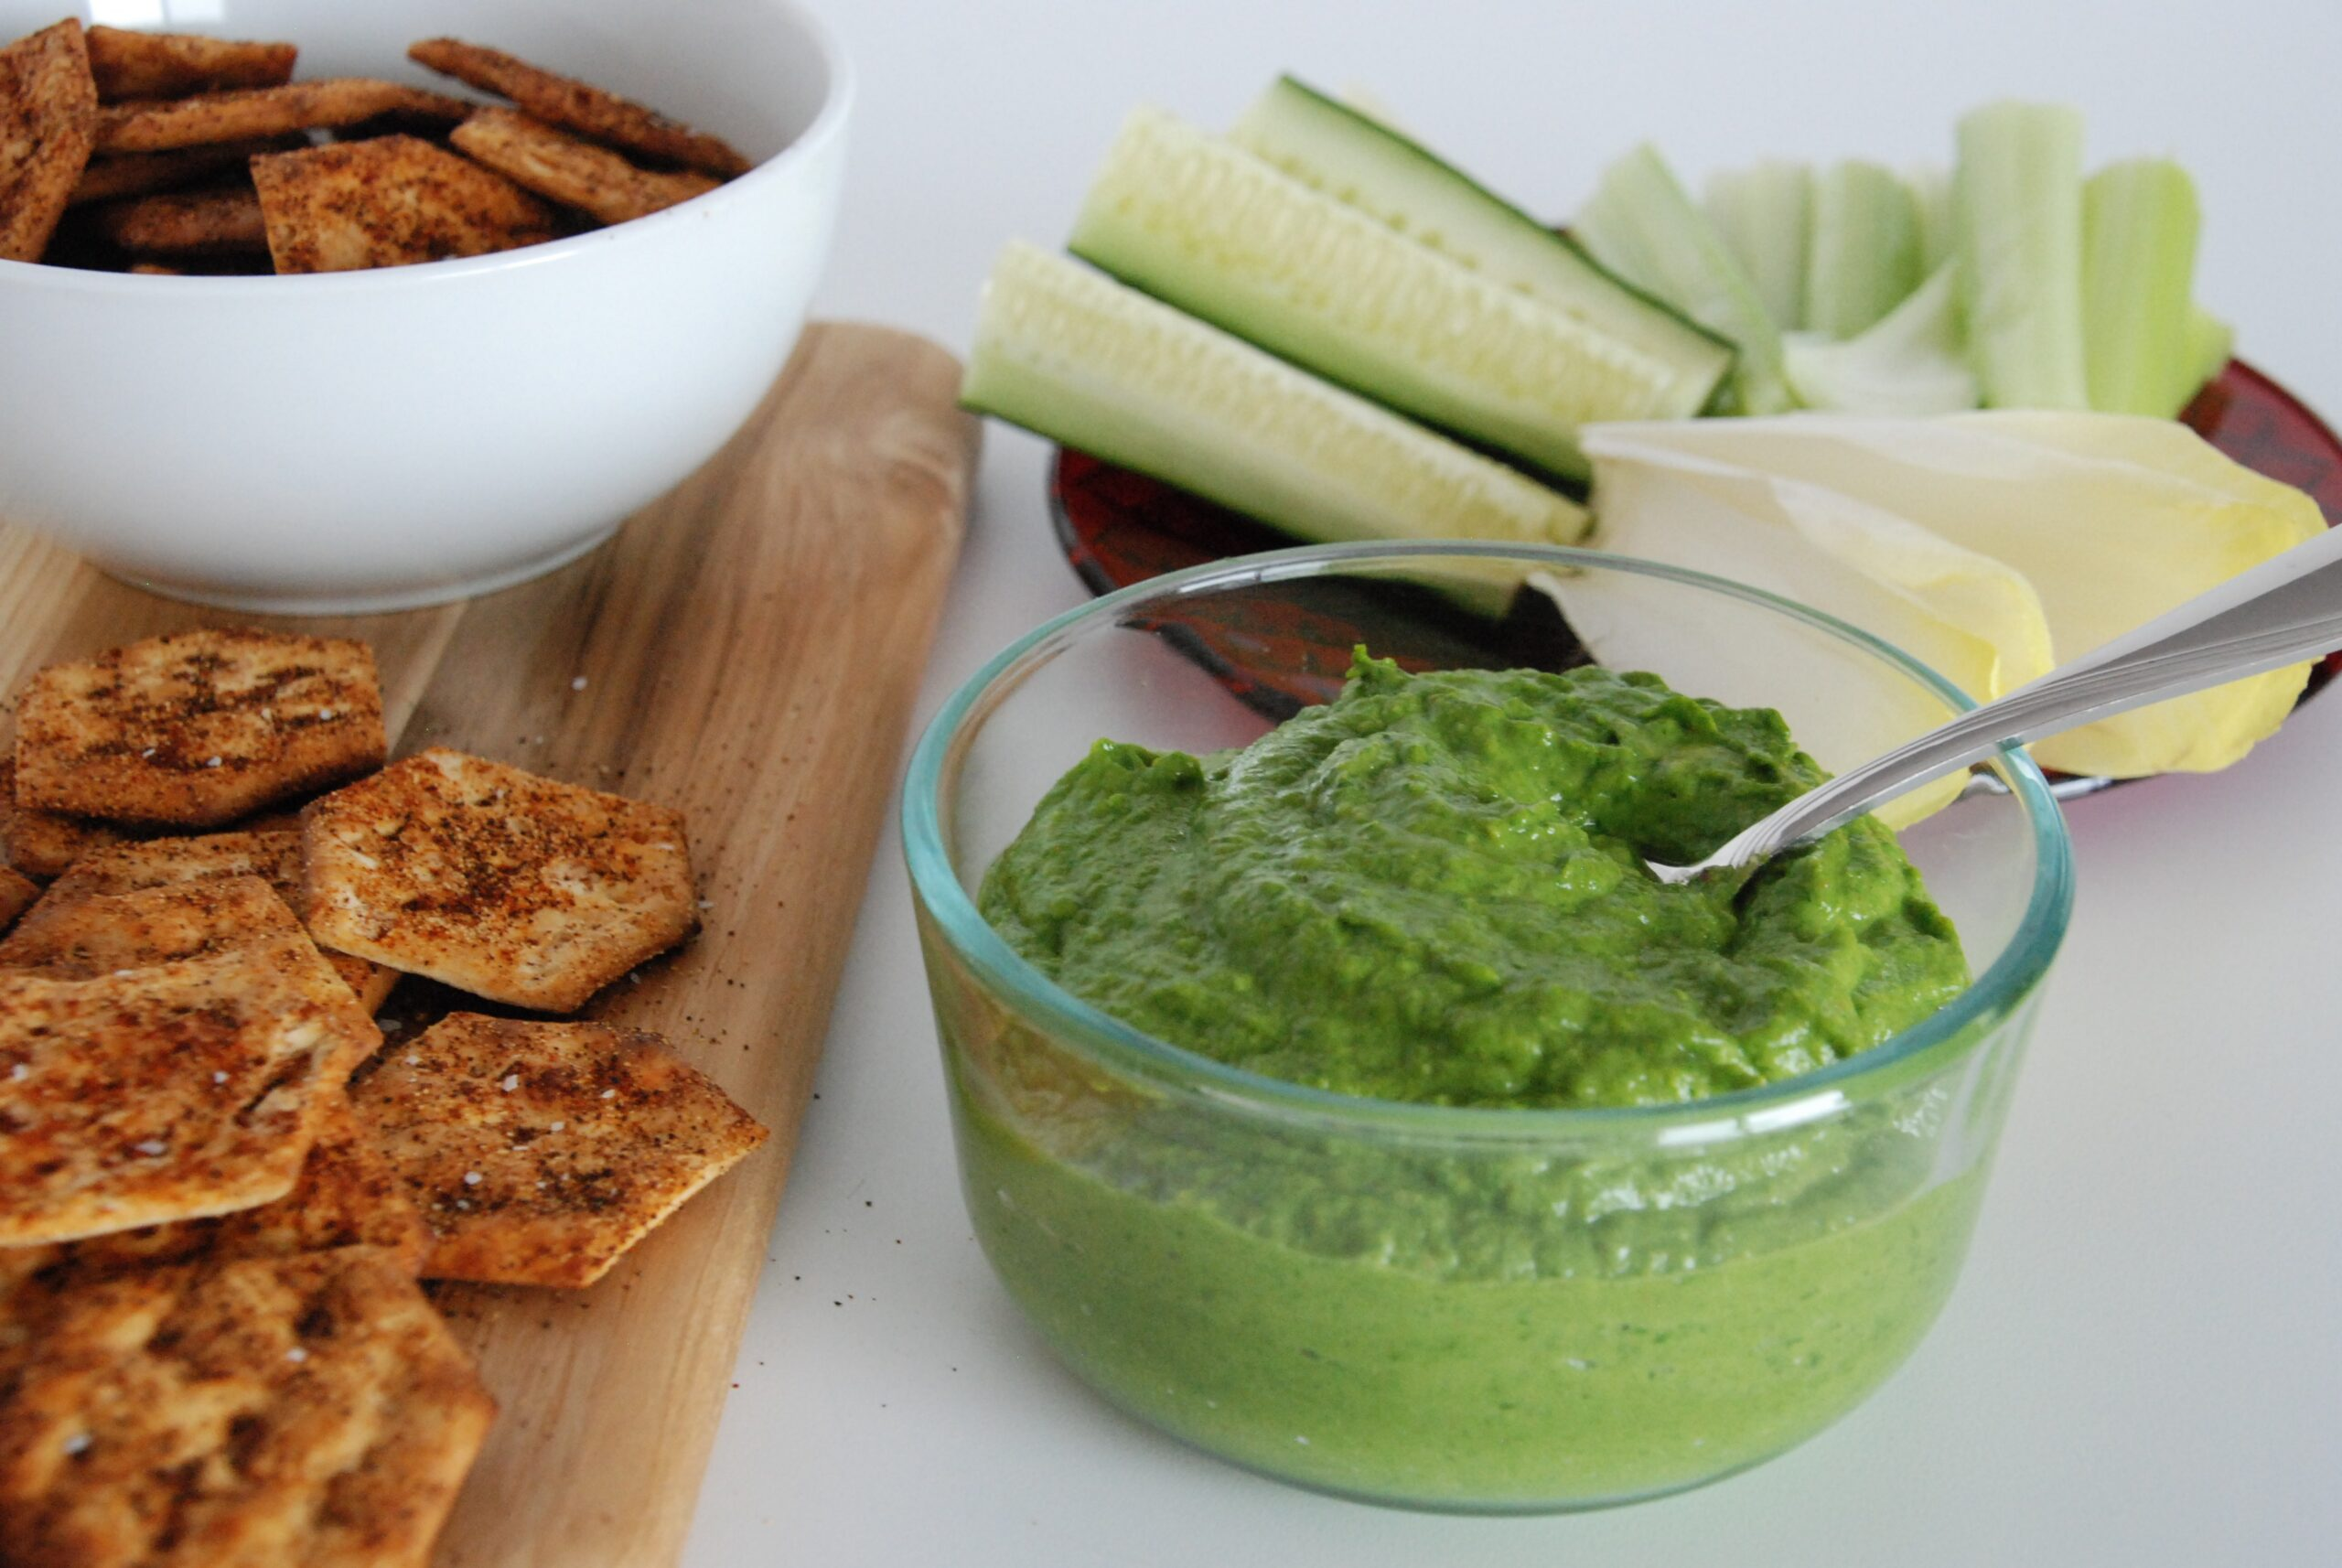 Avocado, Spinach, and Pickled Jalapeño Dip